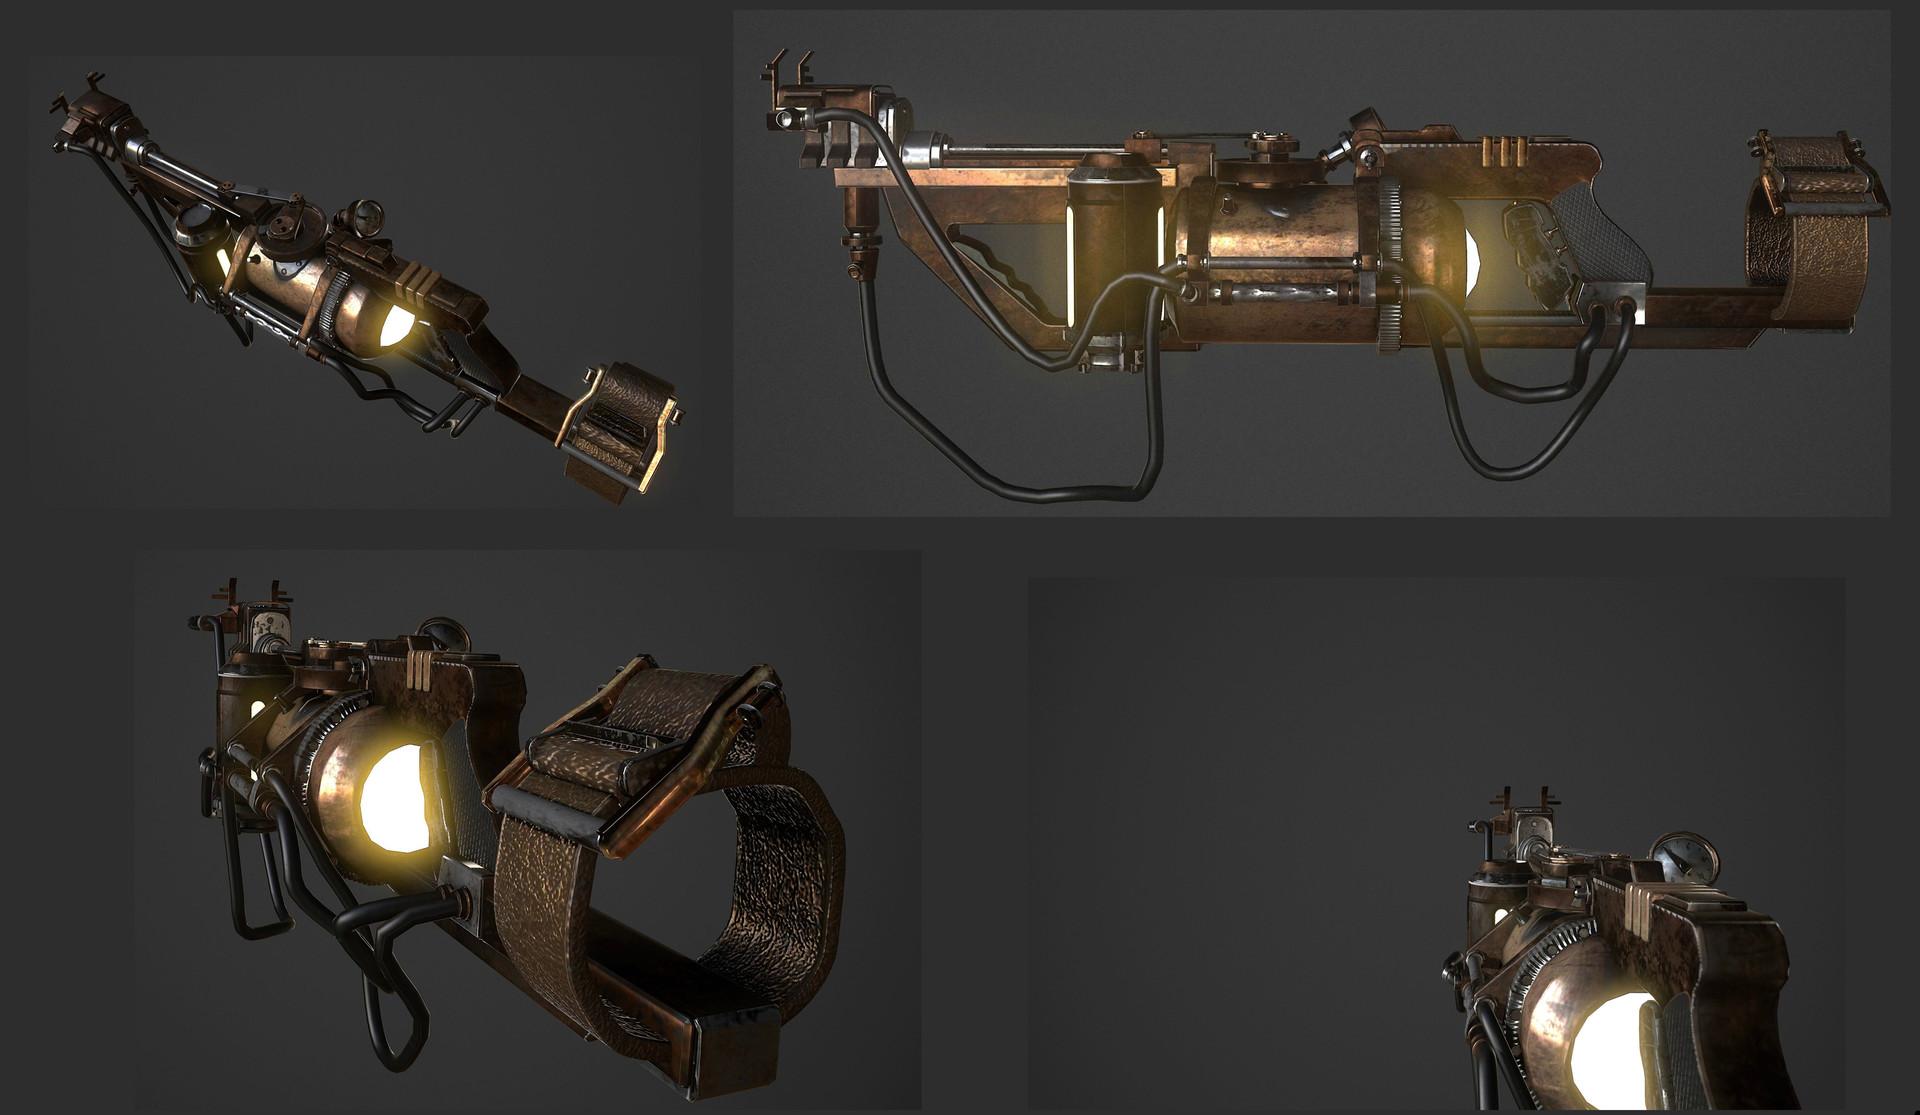 Artstation bioshock 2 rivet gun fanart emily zsarko scroll to see more mozeypictures Images